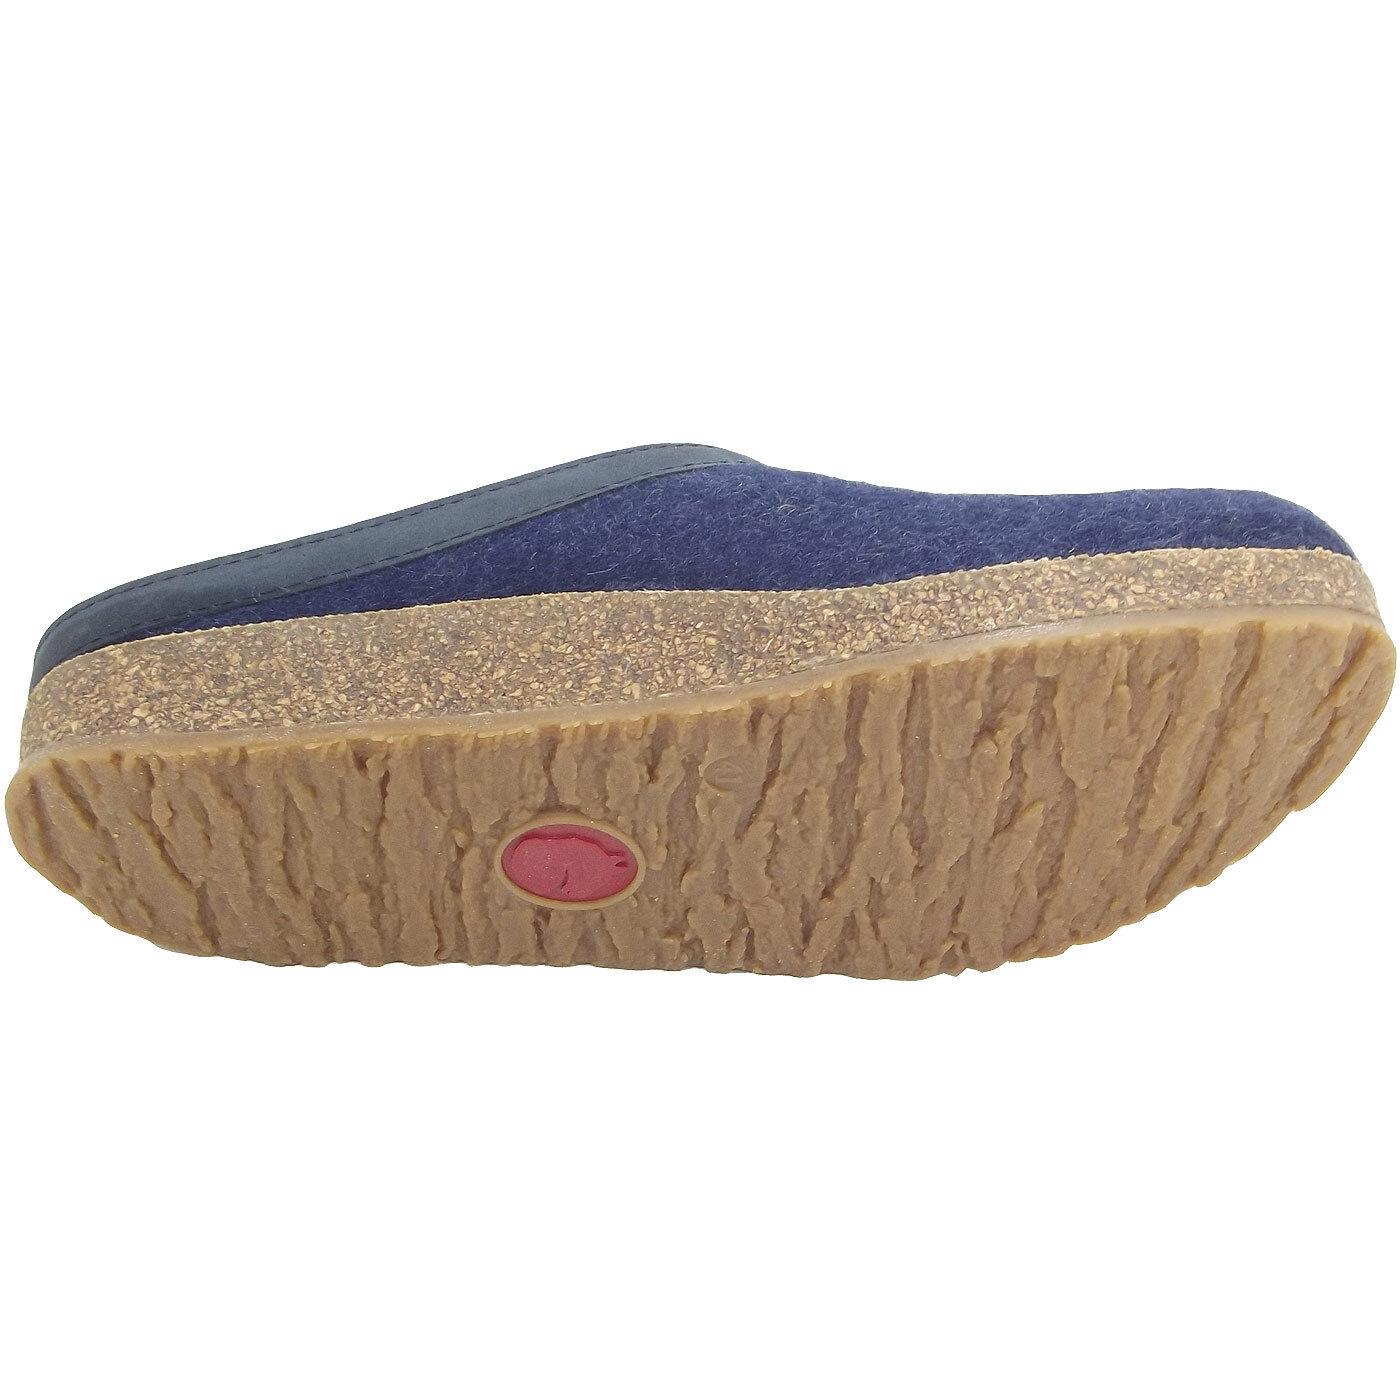 Haflinger Grizzly Grizzly Haflinger Torben Unisex Pantoffeln jeans 609873